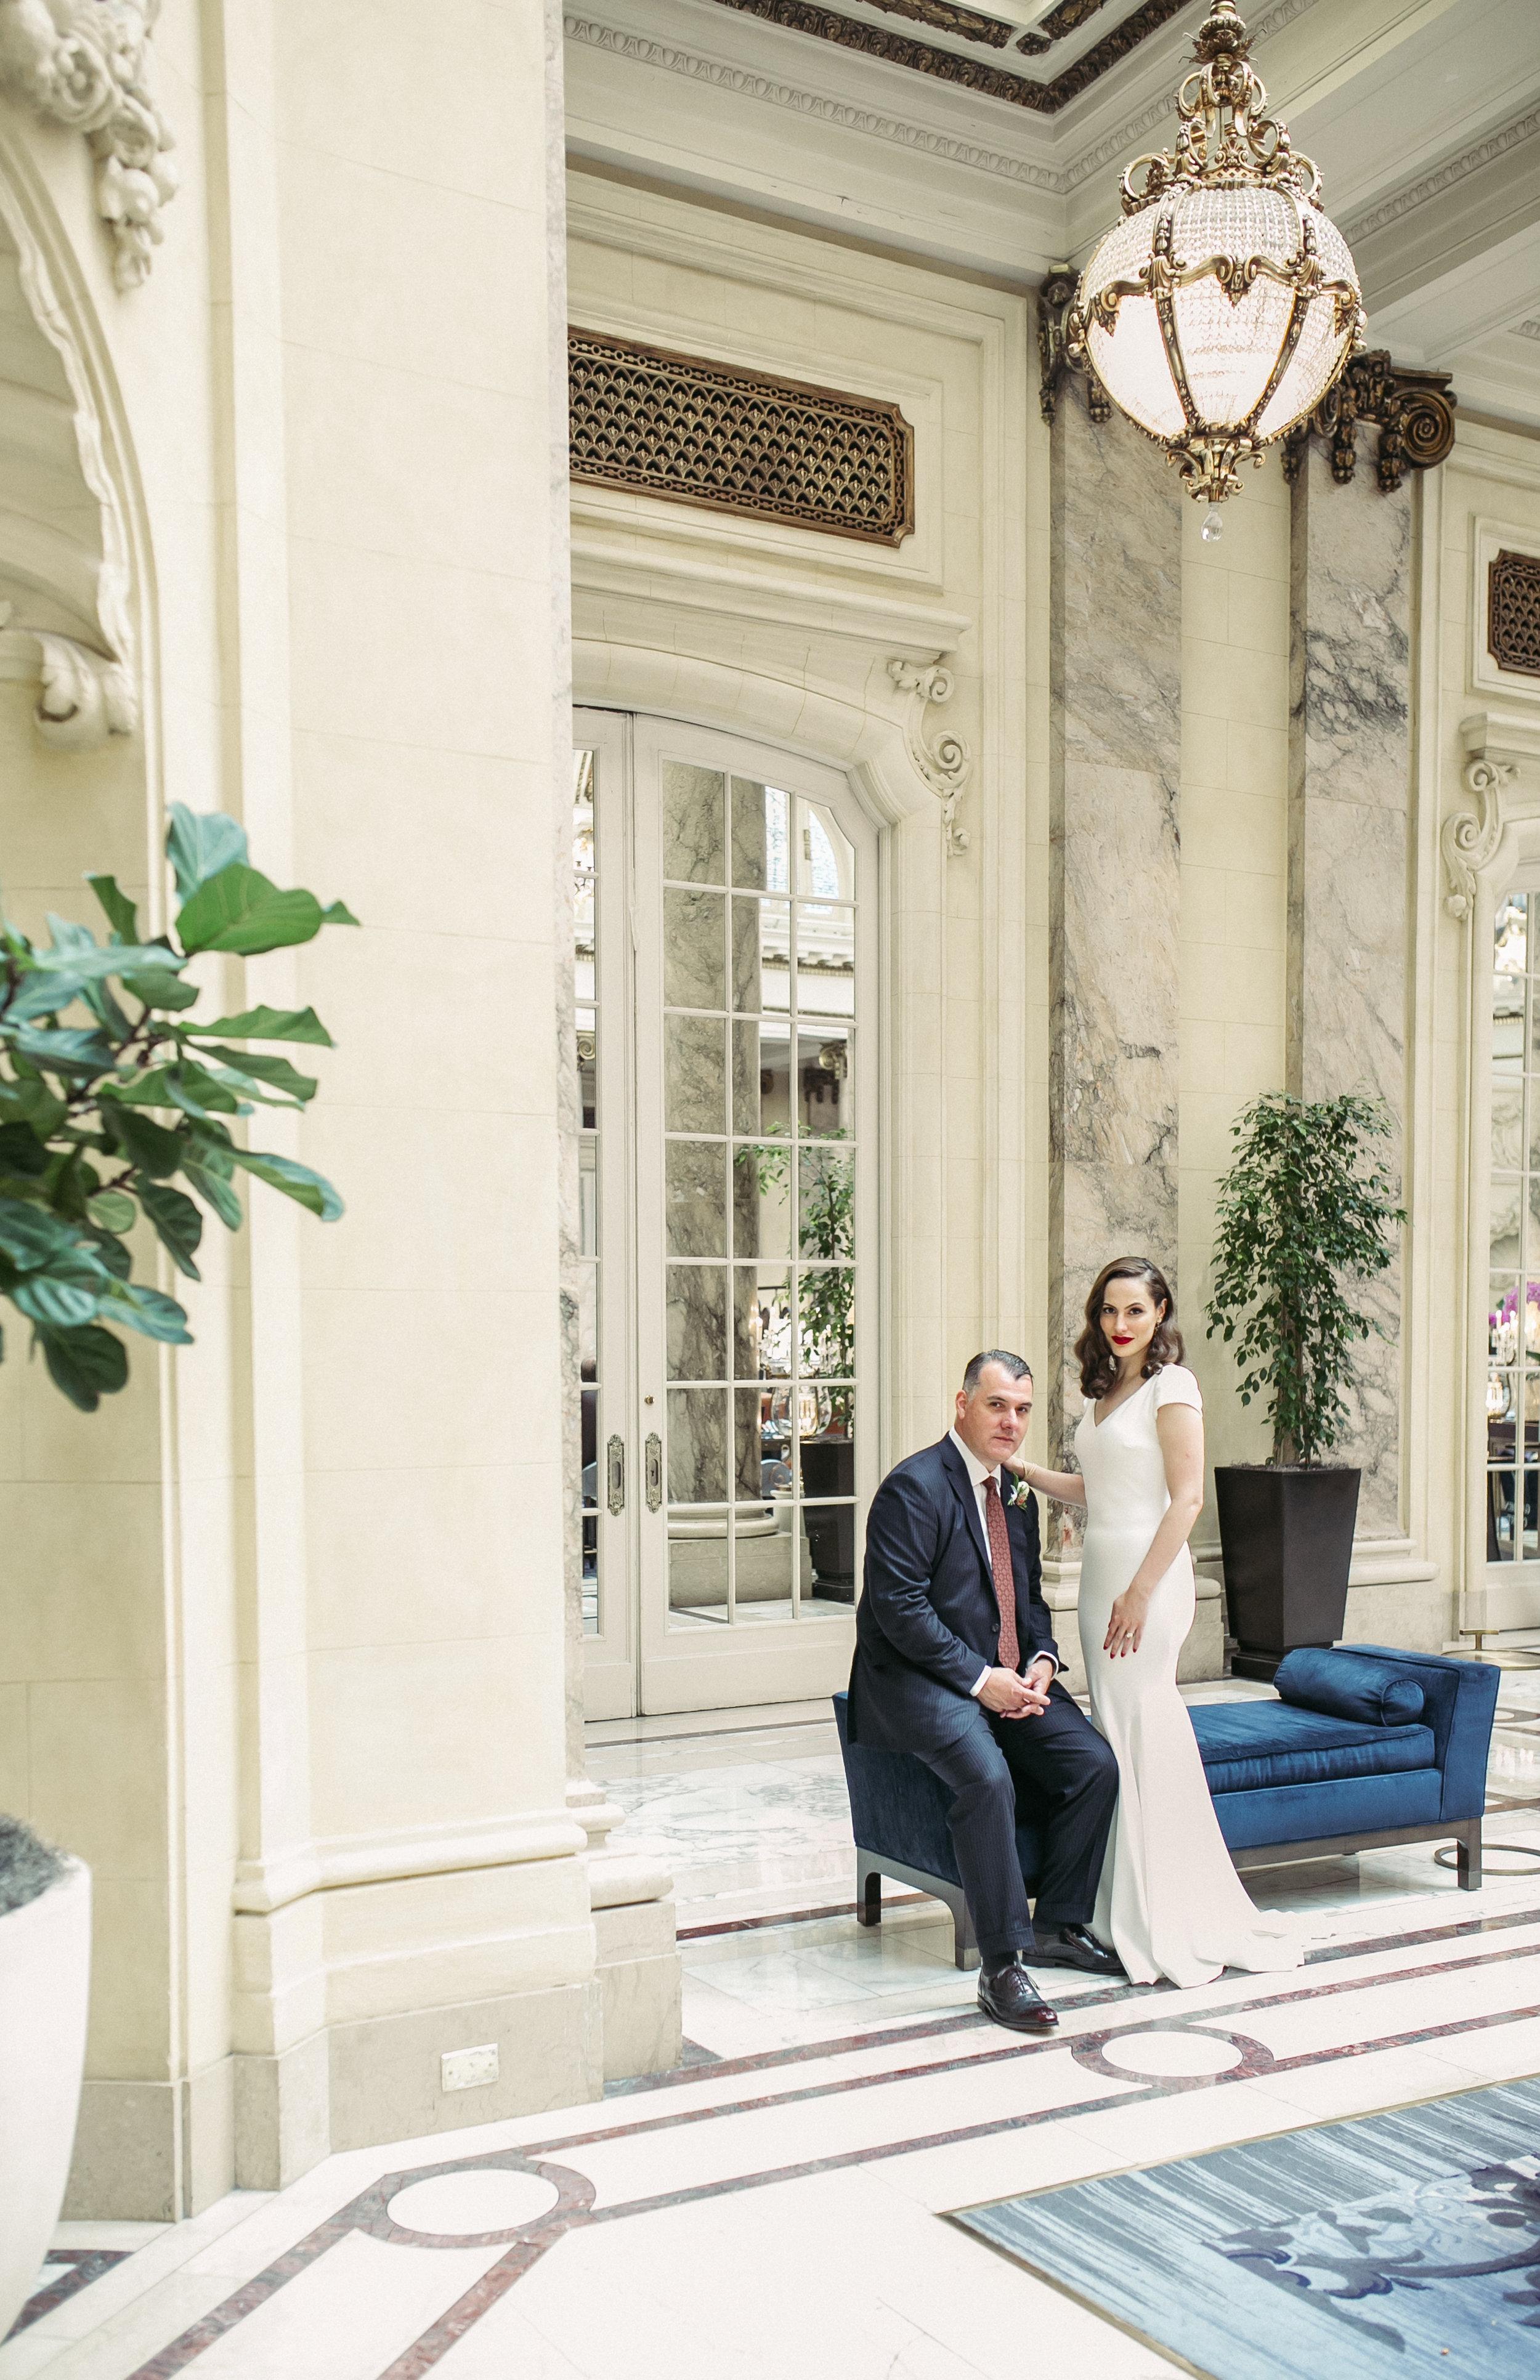 NICOLE+JODY-WEDDING-0358-012171.jpg